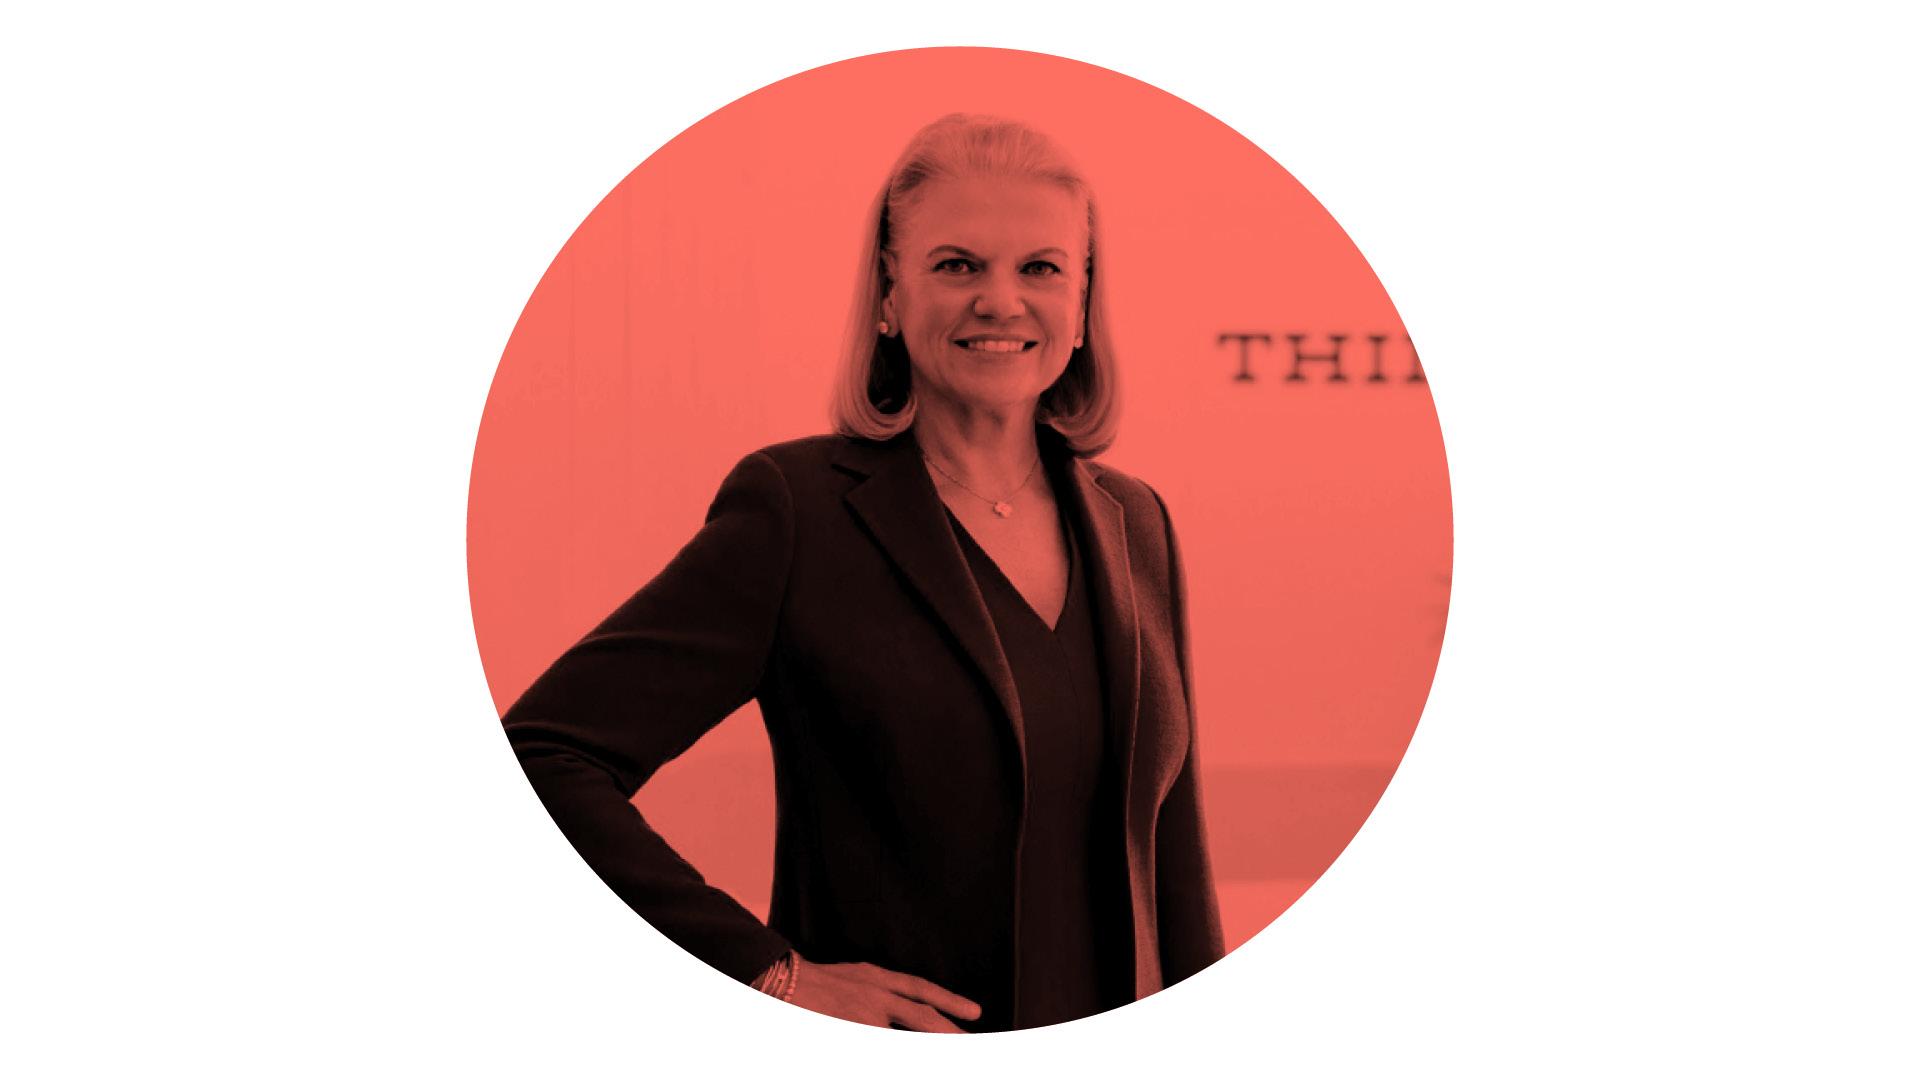 IBM: The Necessary Revolution